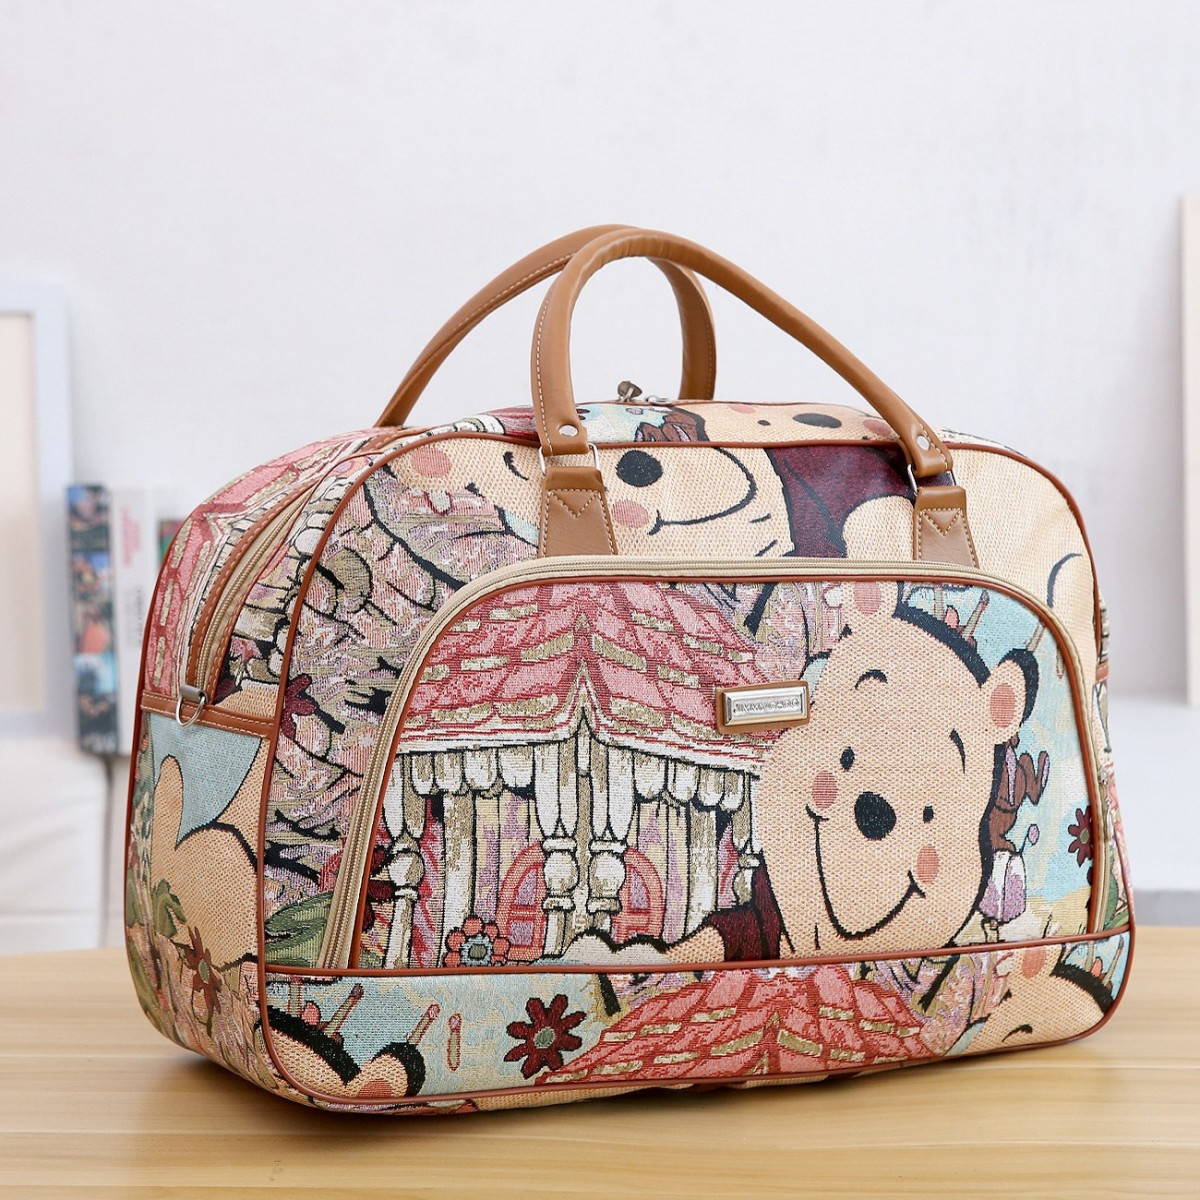 52*35*21cm Women Hand PU Leather Travel Duffle Bags Pu Leather Weekend Bag Winnie The Pooh Cartoon Large Waterproof Travel Bag